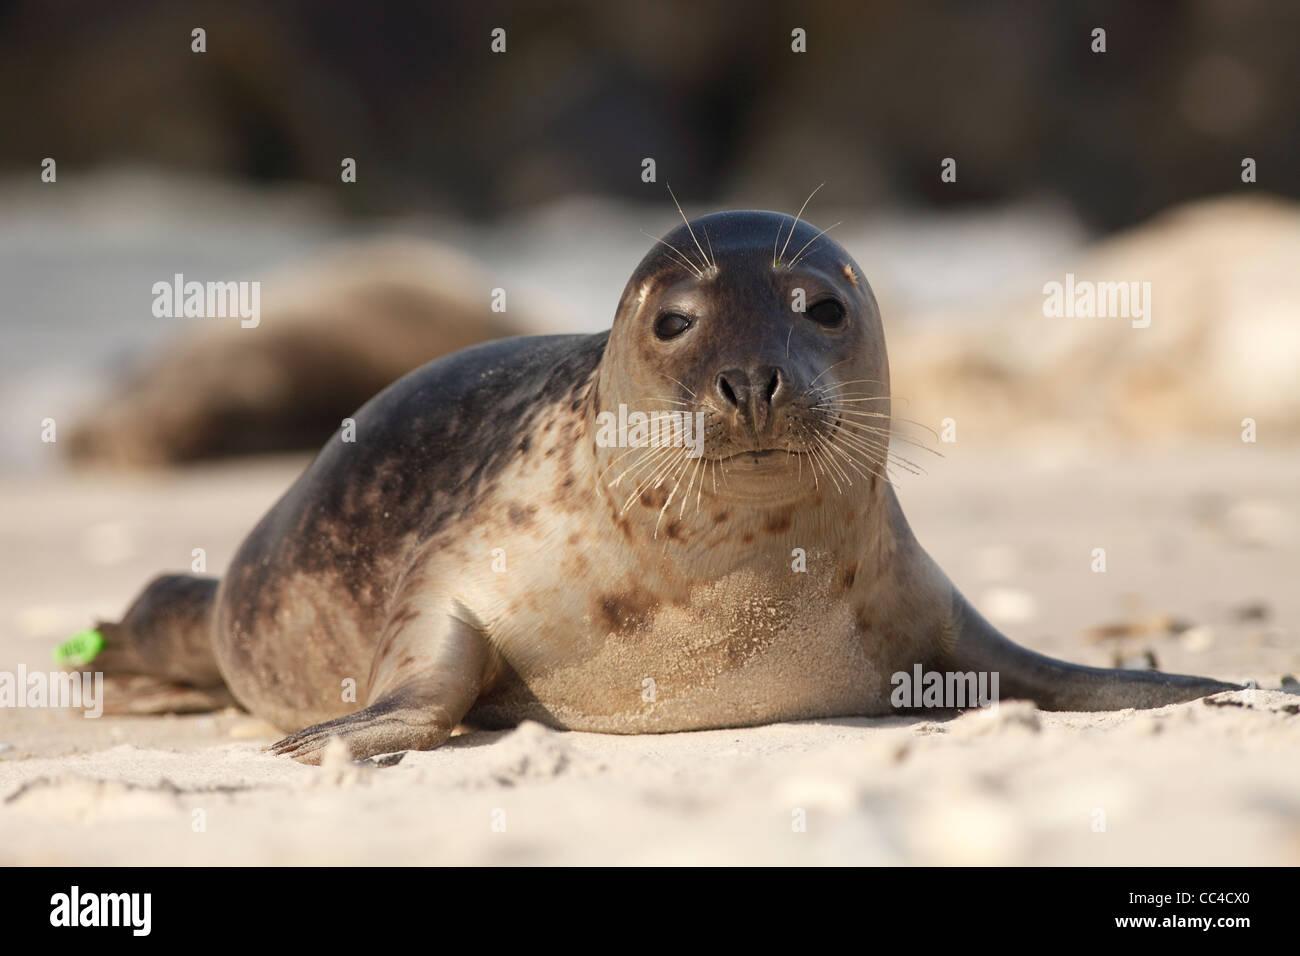 grey seal; Latin: Halichoerus grypus - Stock Image